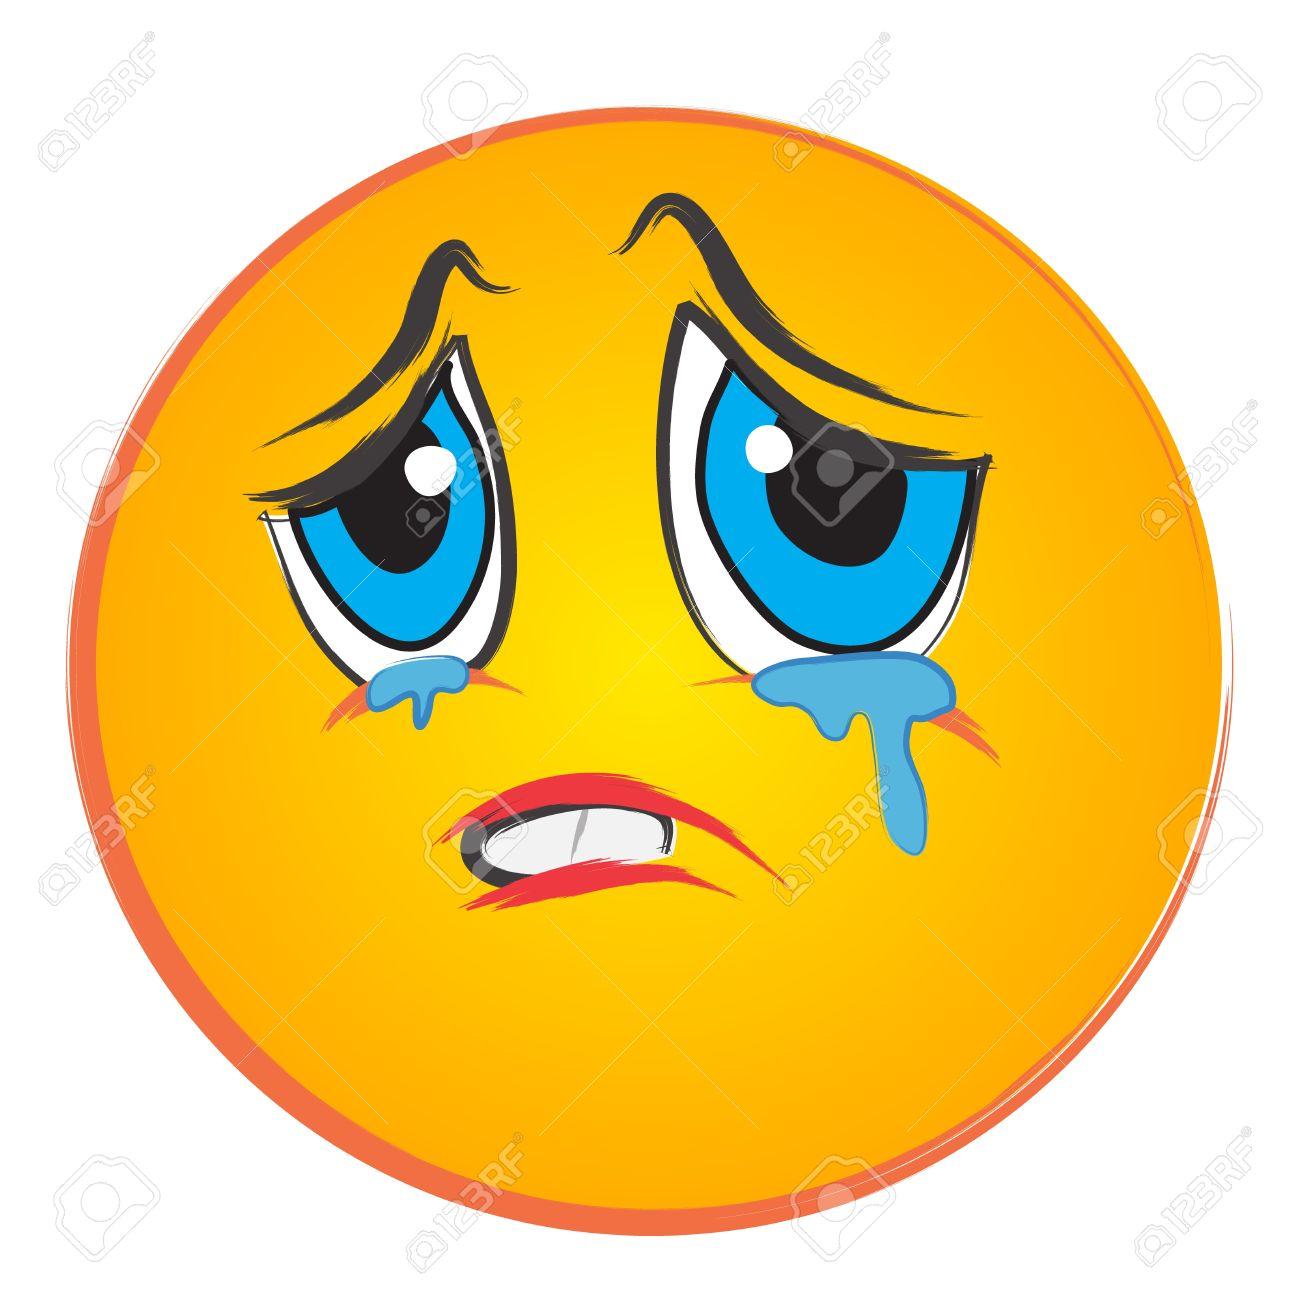 86+ Sad Face With Tears... Sad Face Images Clip Art   ClipartLook